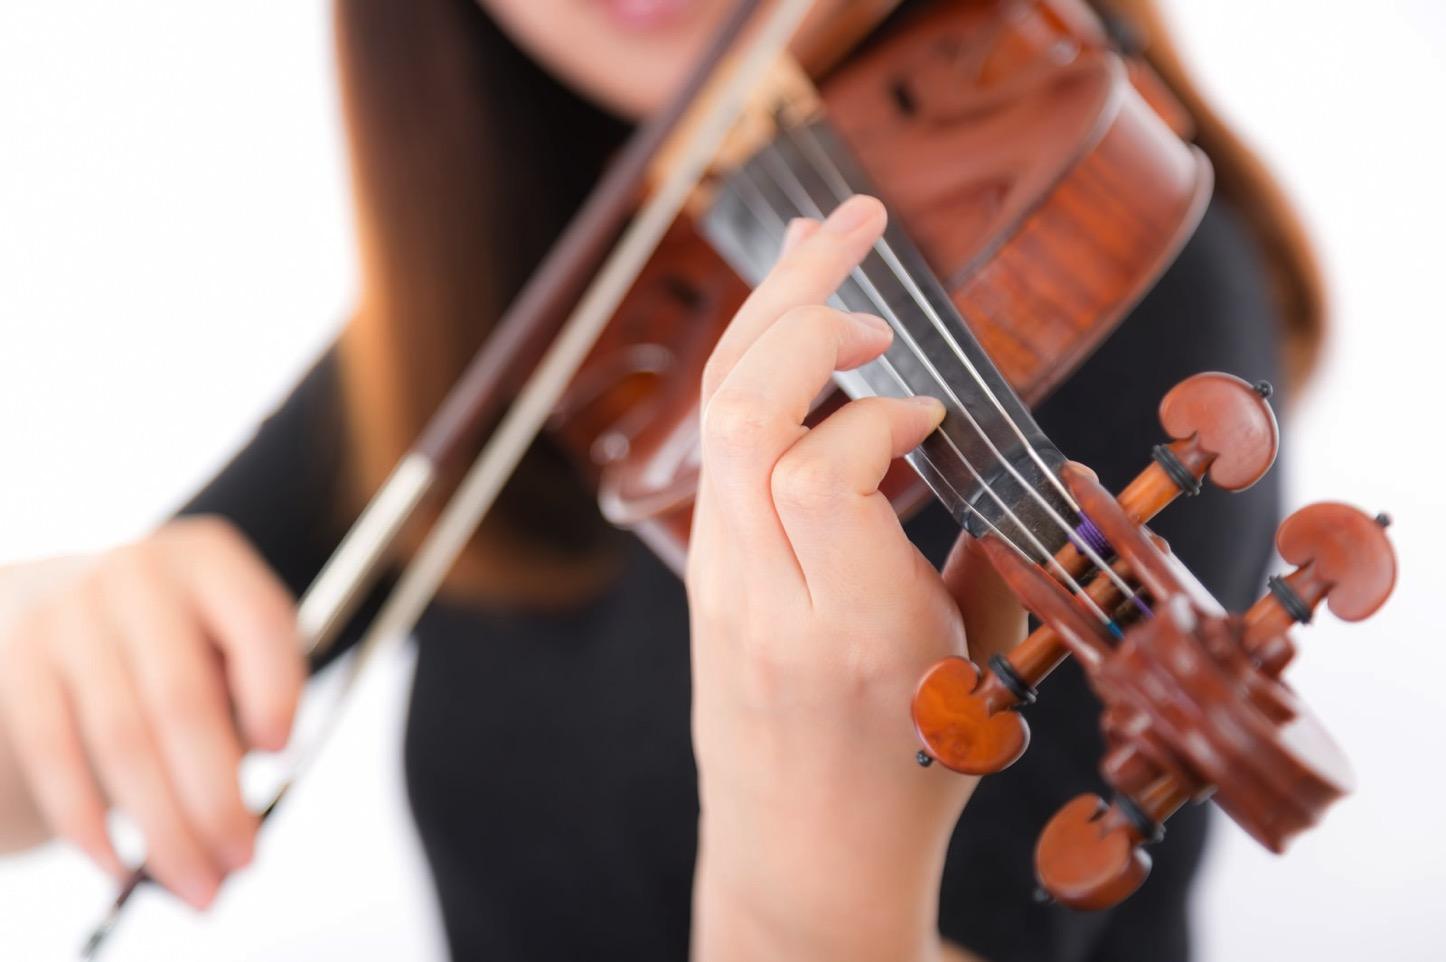 Violinist Pakutaso